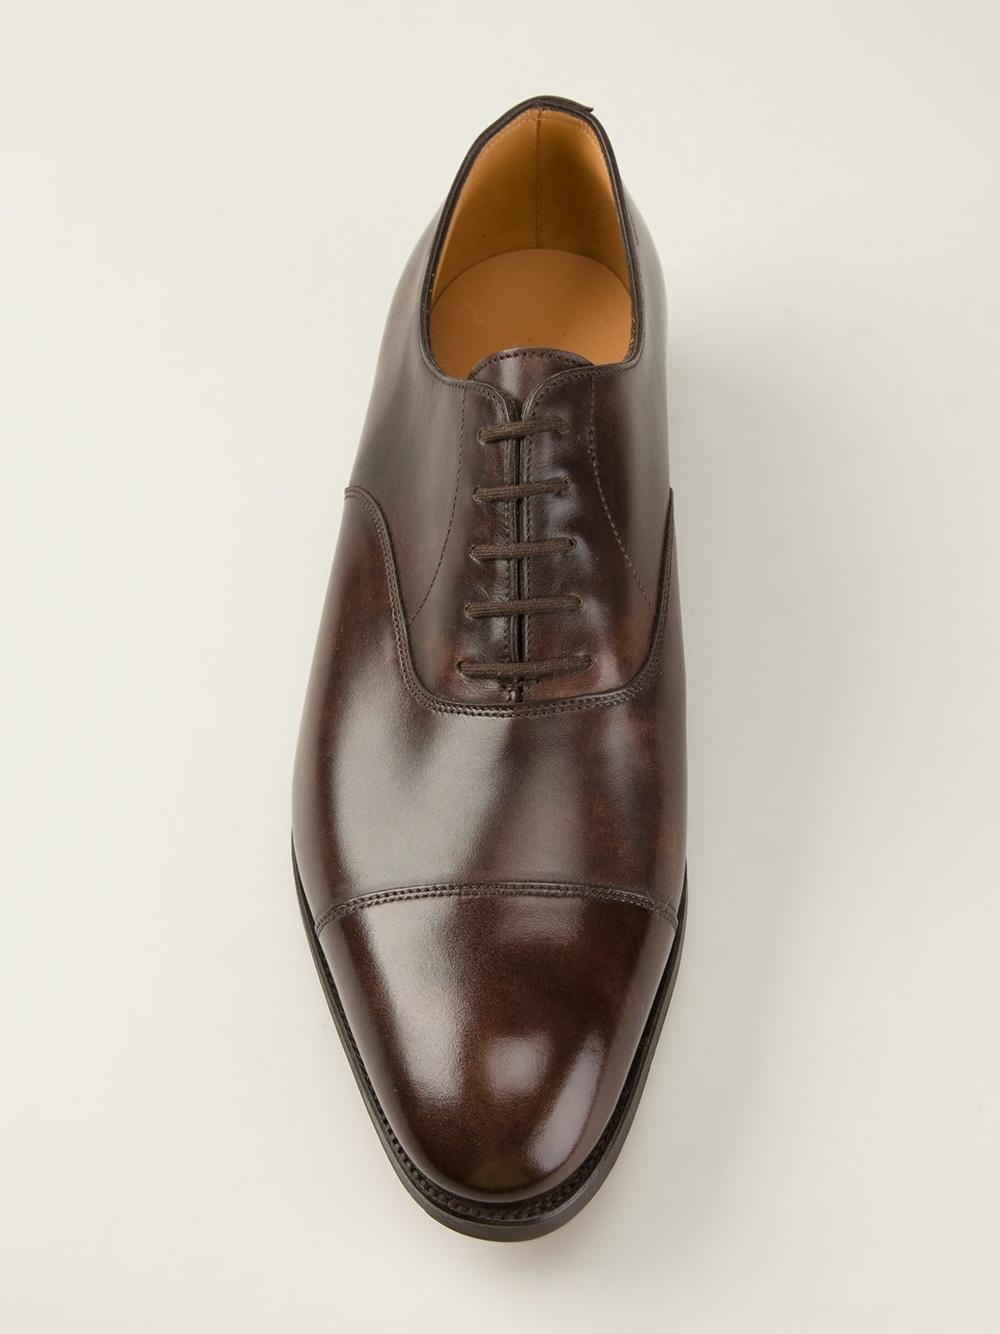 John Lobb Shoes >> Lyst - John Lobb 'city 2' Oxford Shoes in Brown for Men